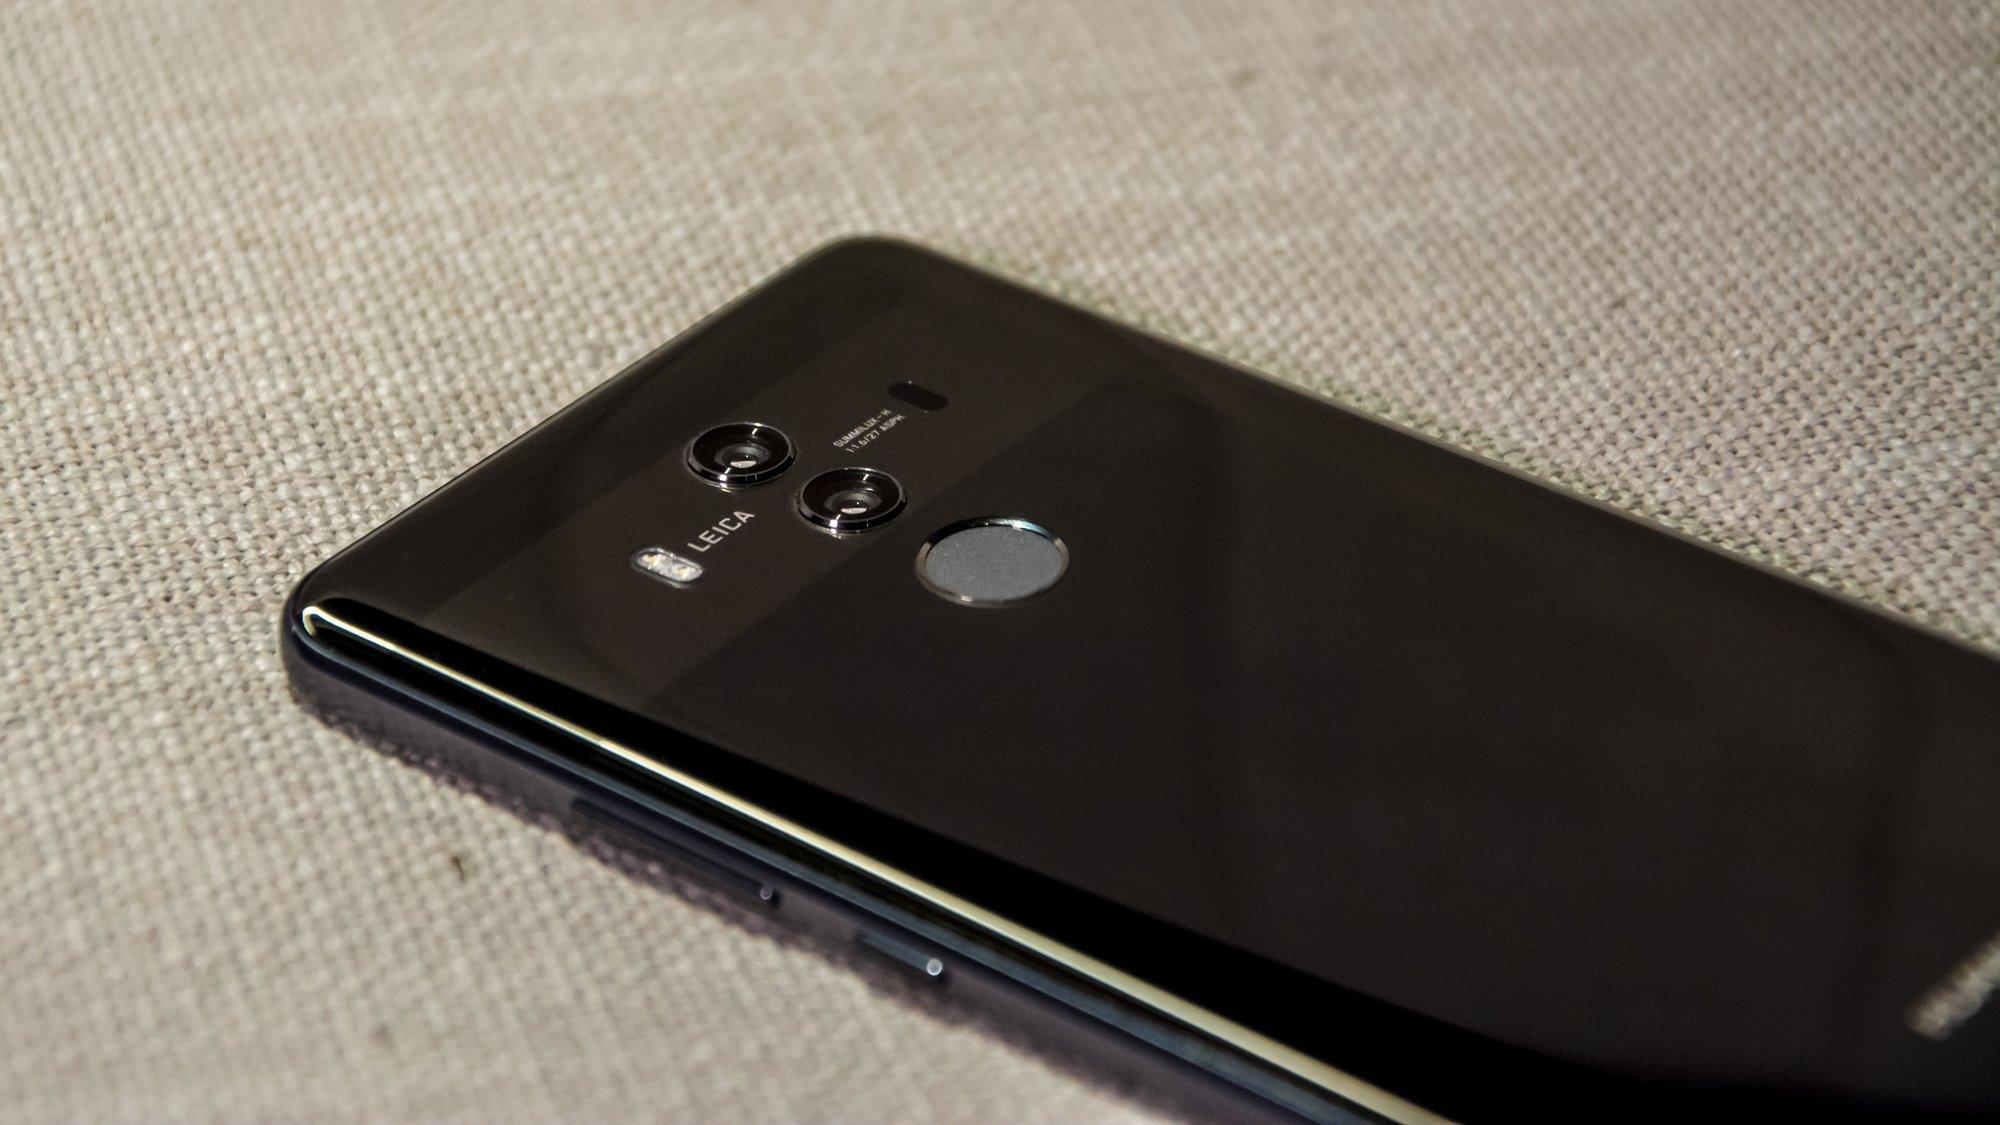 Kakav je novi Huawei Mate 20?